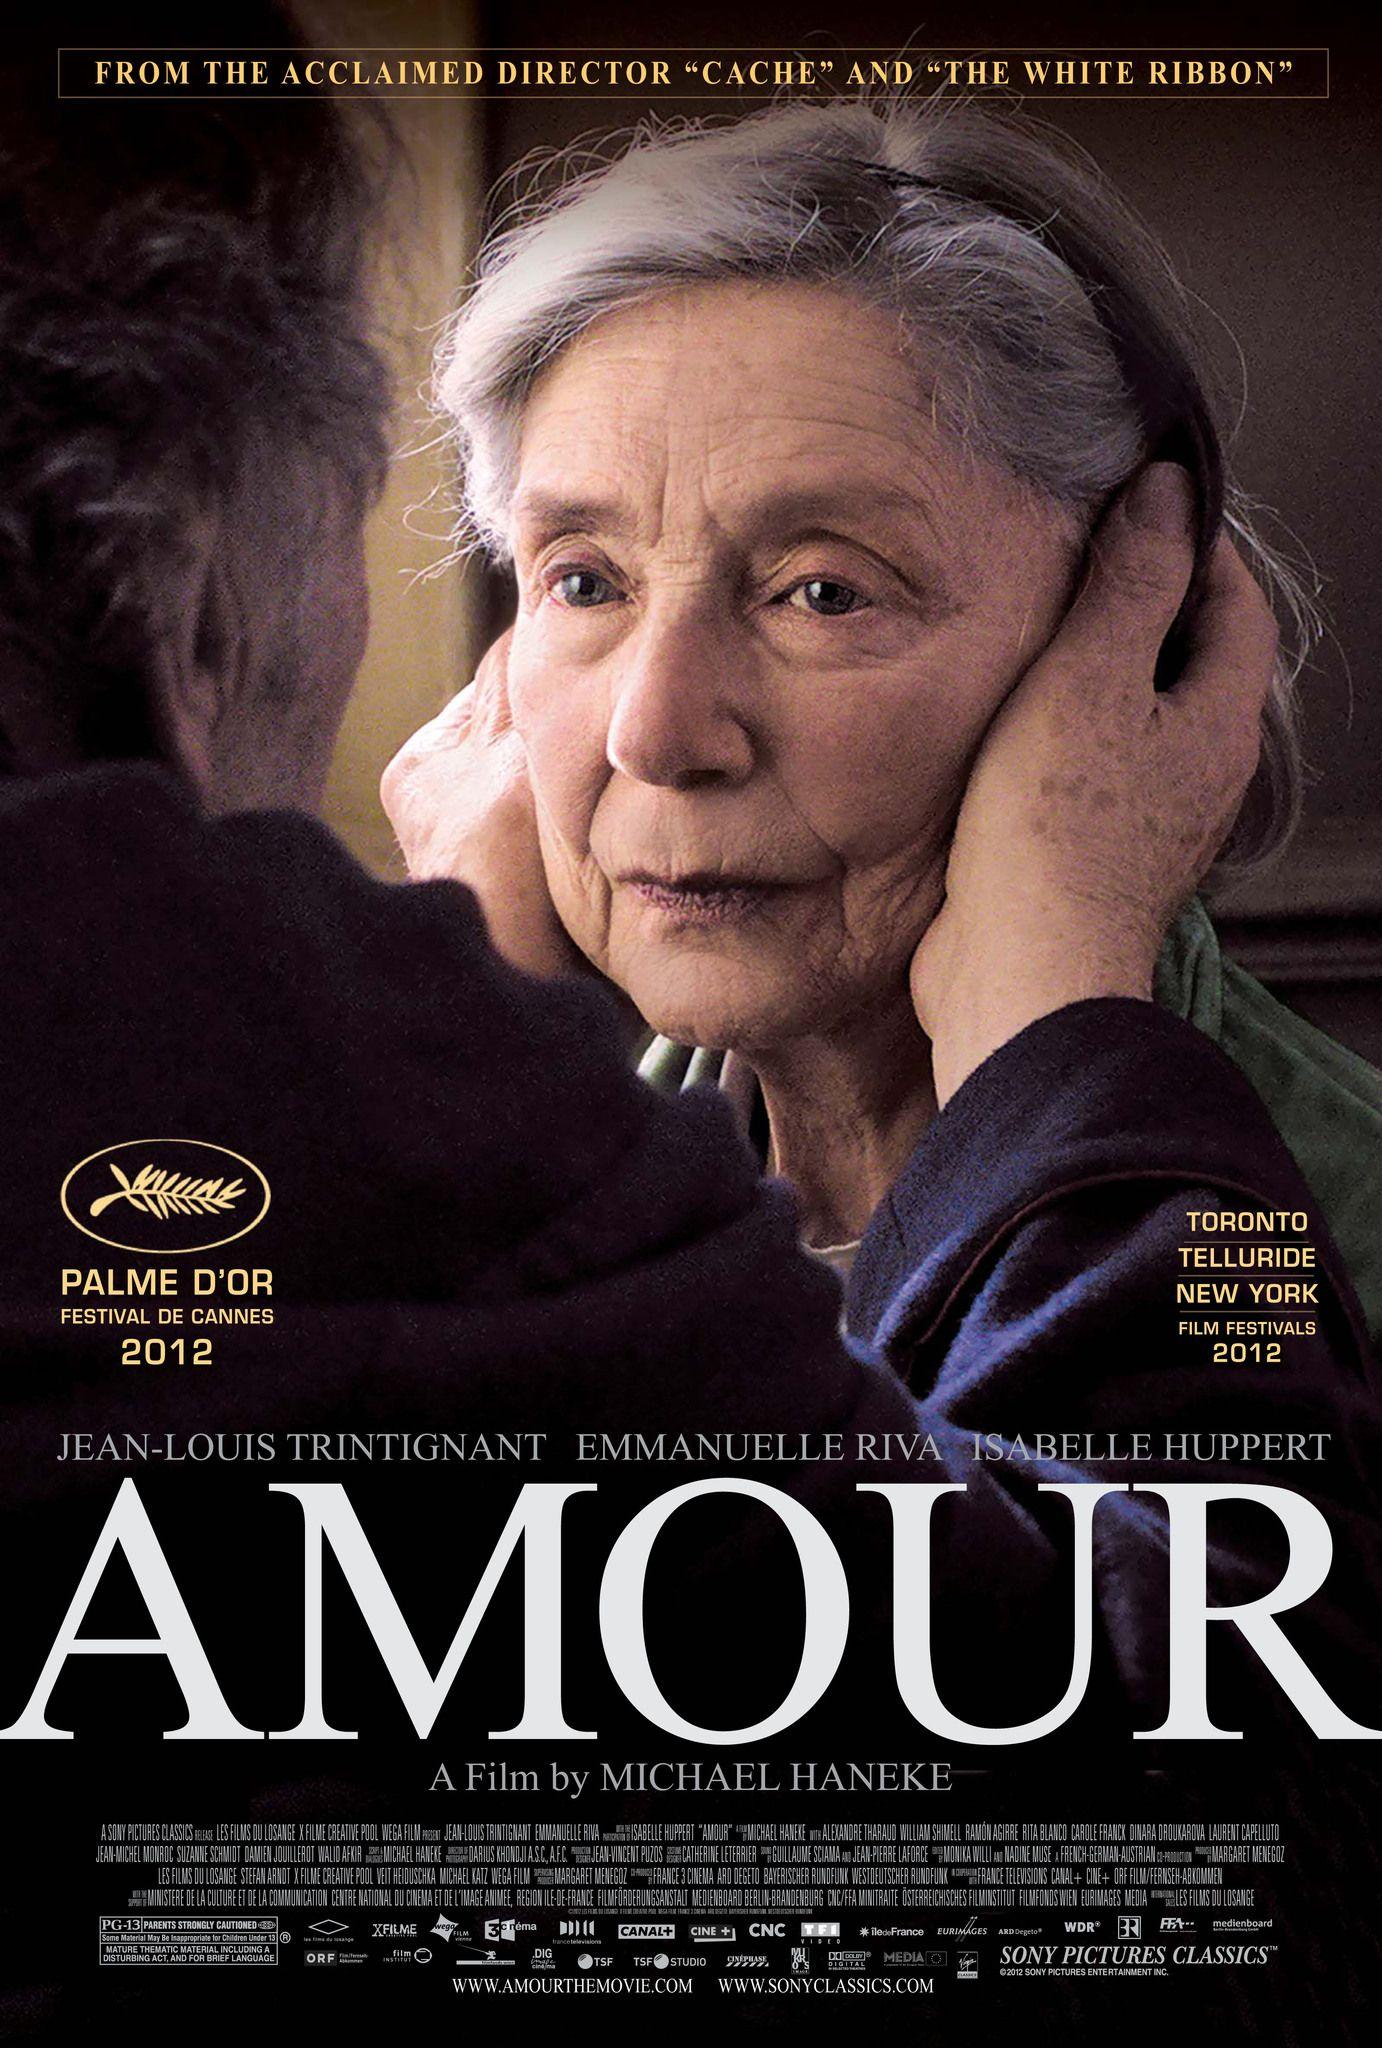 Amour 2012 Genre Drama Romance Pg 13 My Rating 8 10 Peliculas Peliculas Cine Peliculas Romanticas